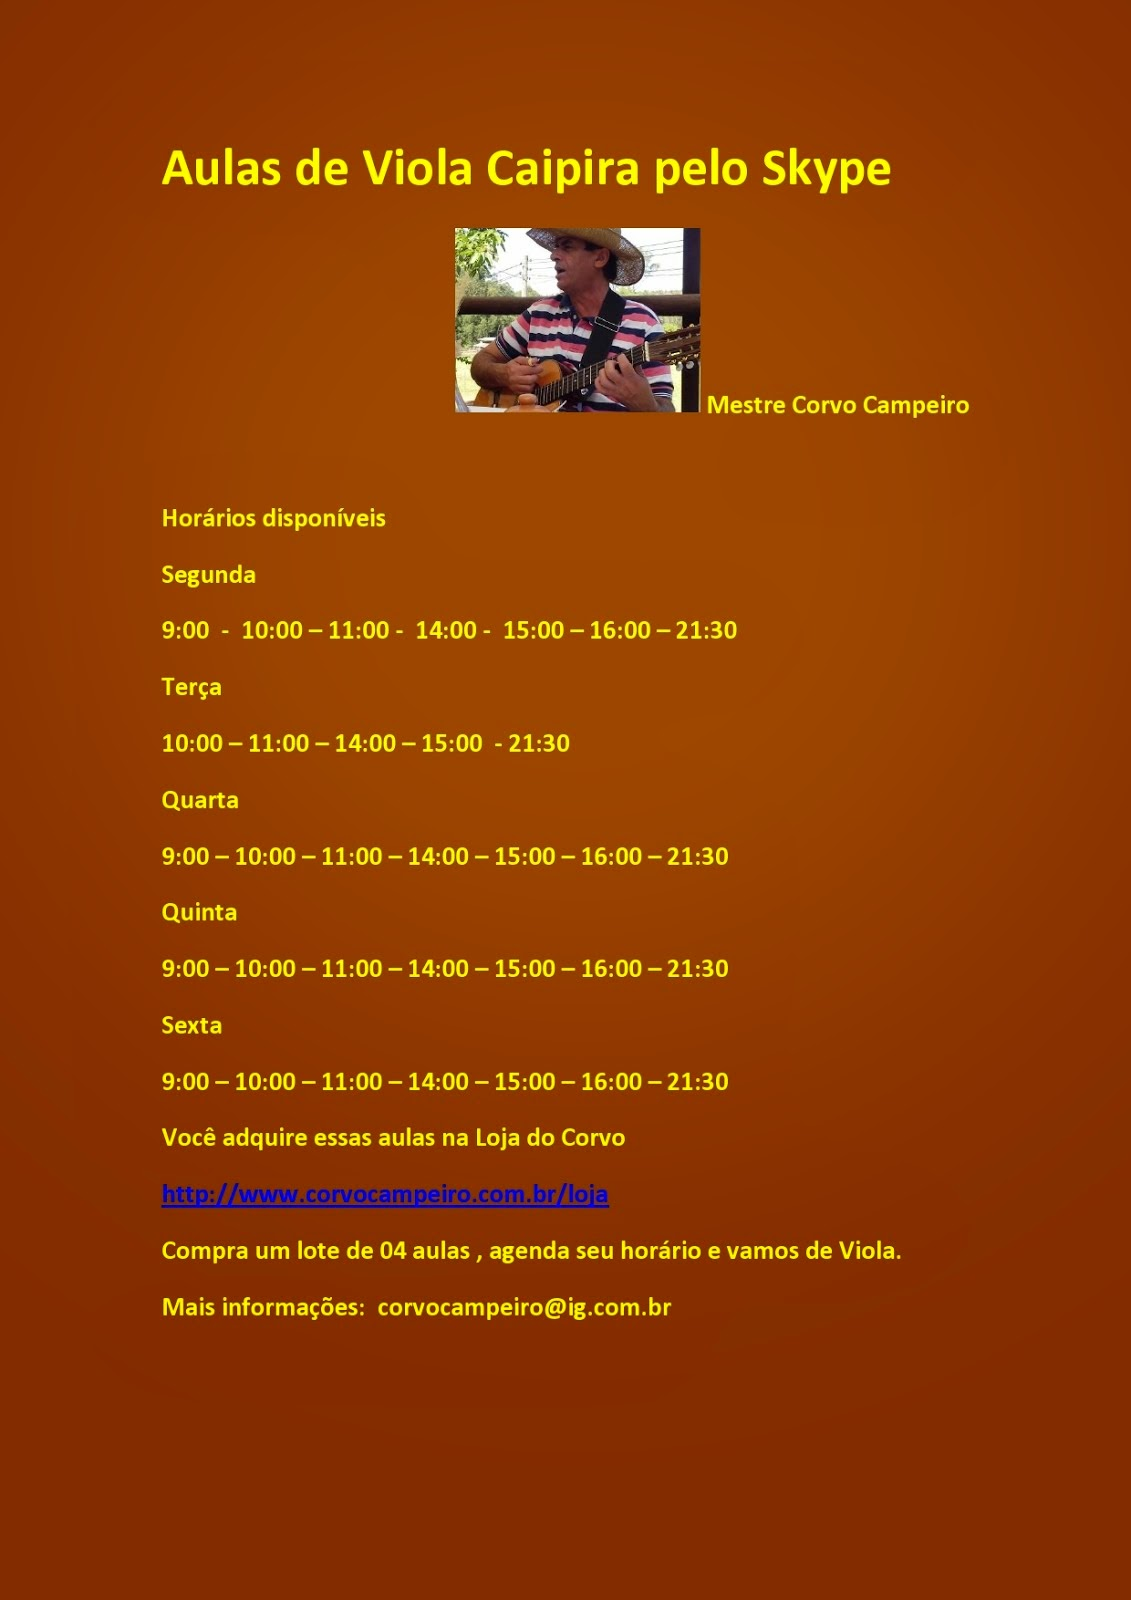 Horarios disponíveis para Aula On line